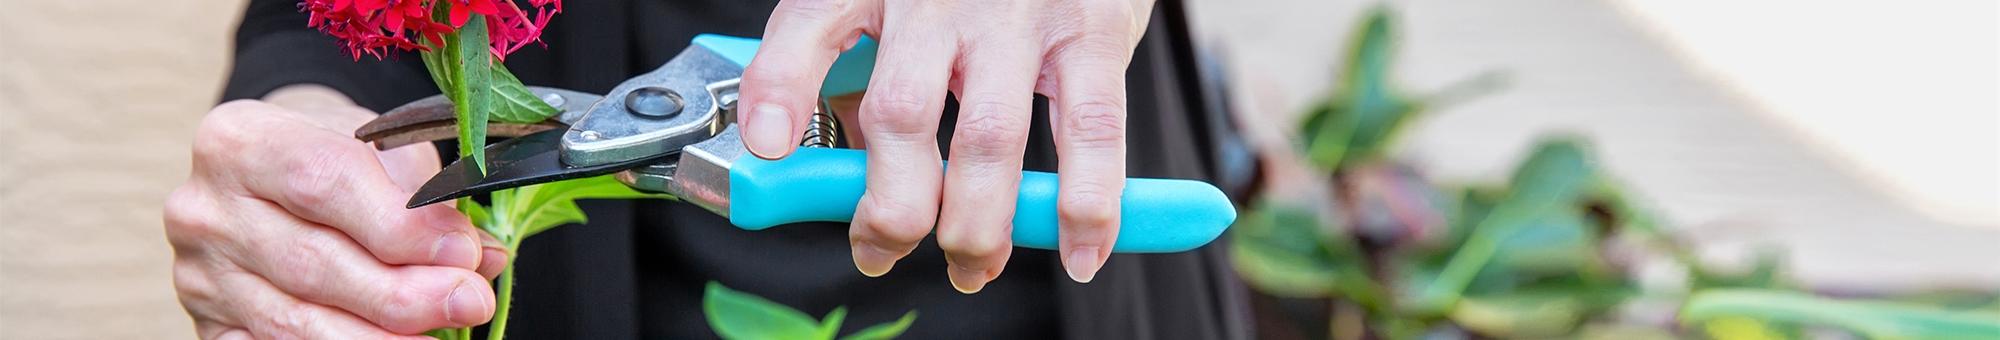 Arthritis - Care